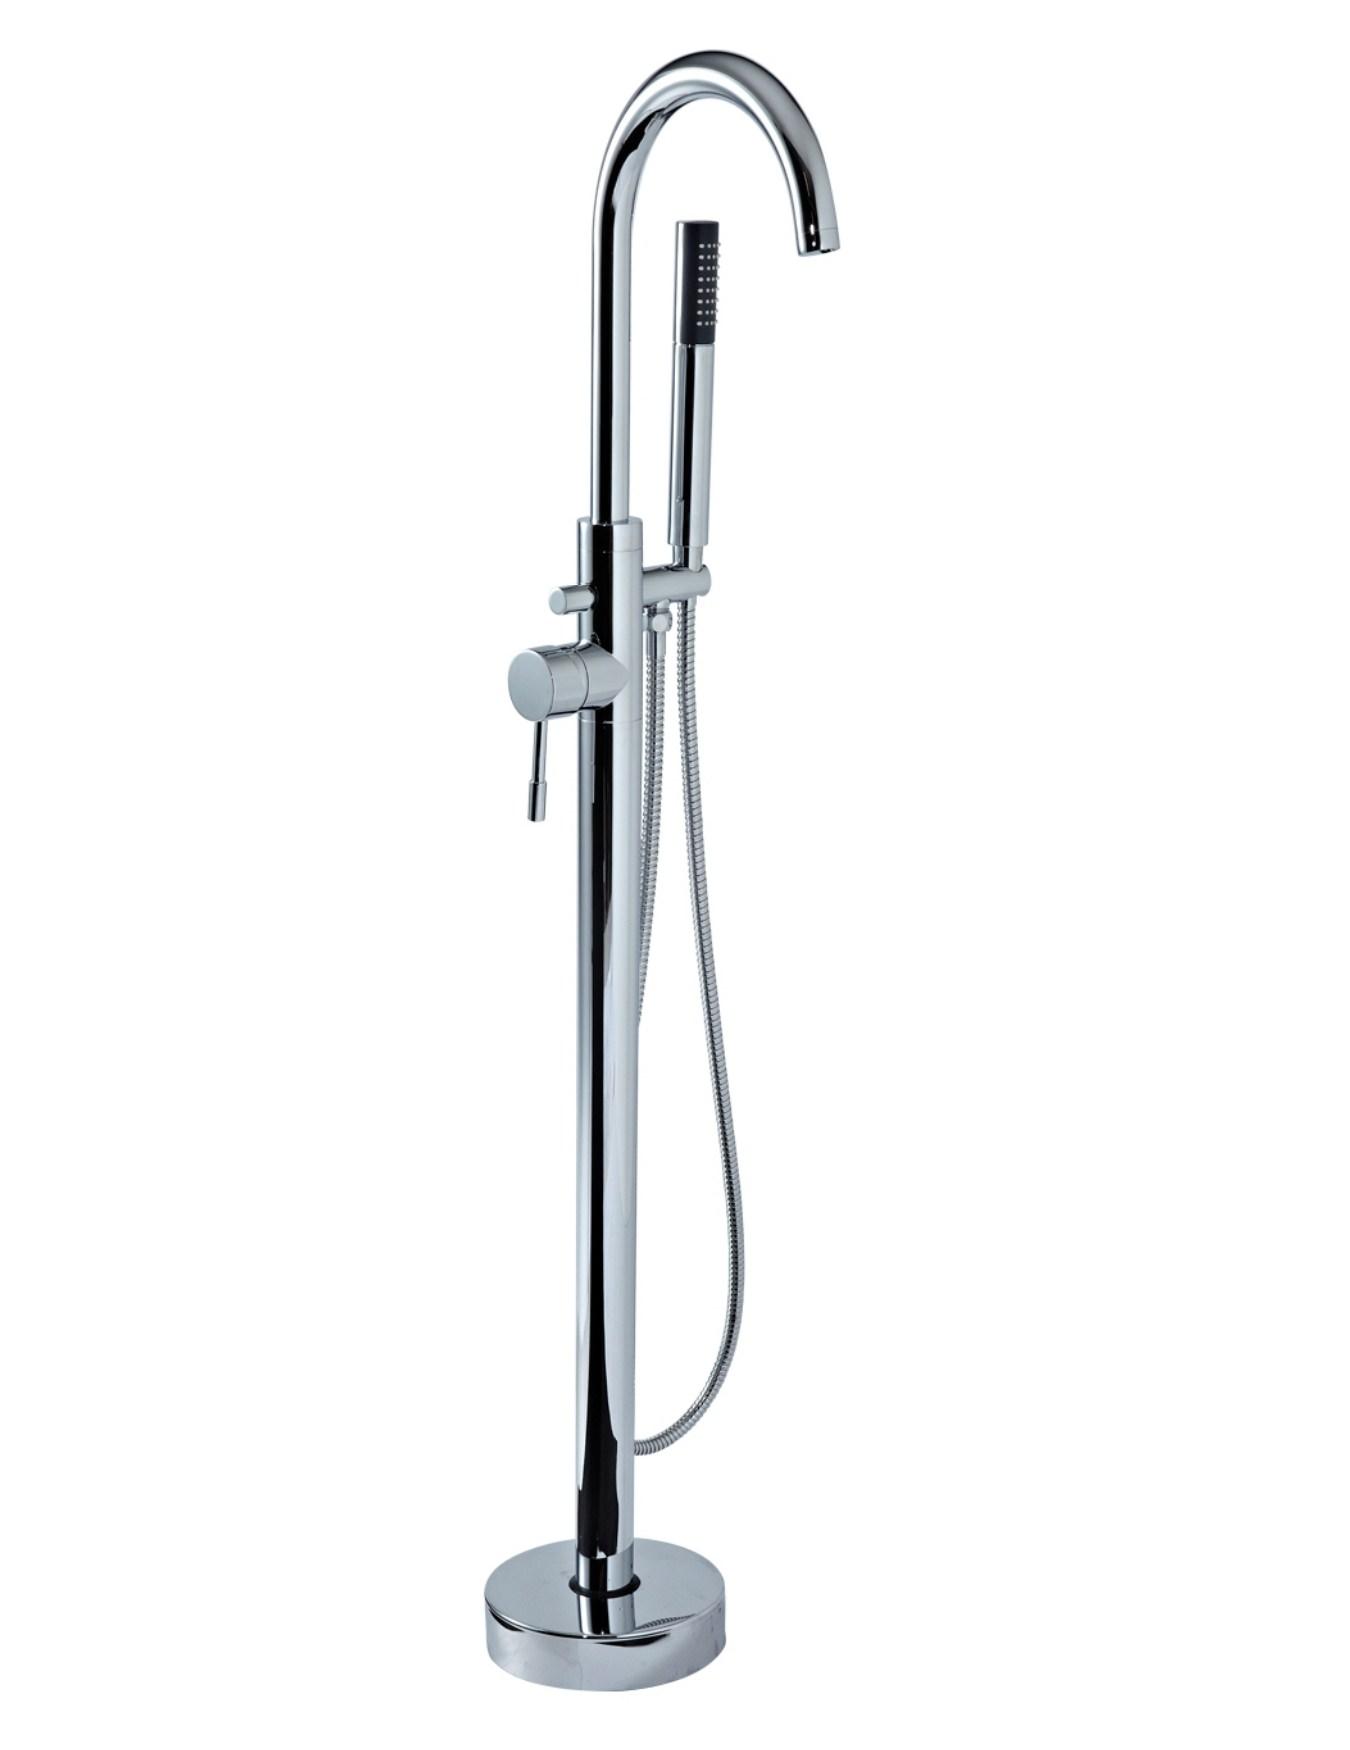 Phoenix AR Series Freestanding Mono Bath Shower Mixer Tap Chrome